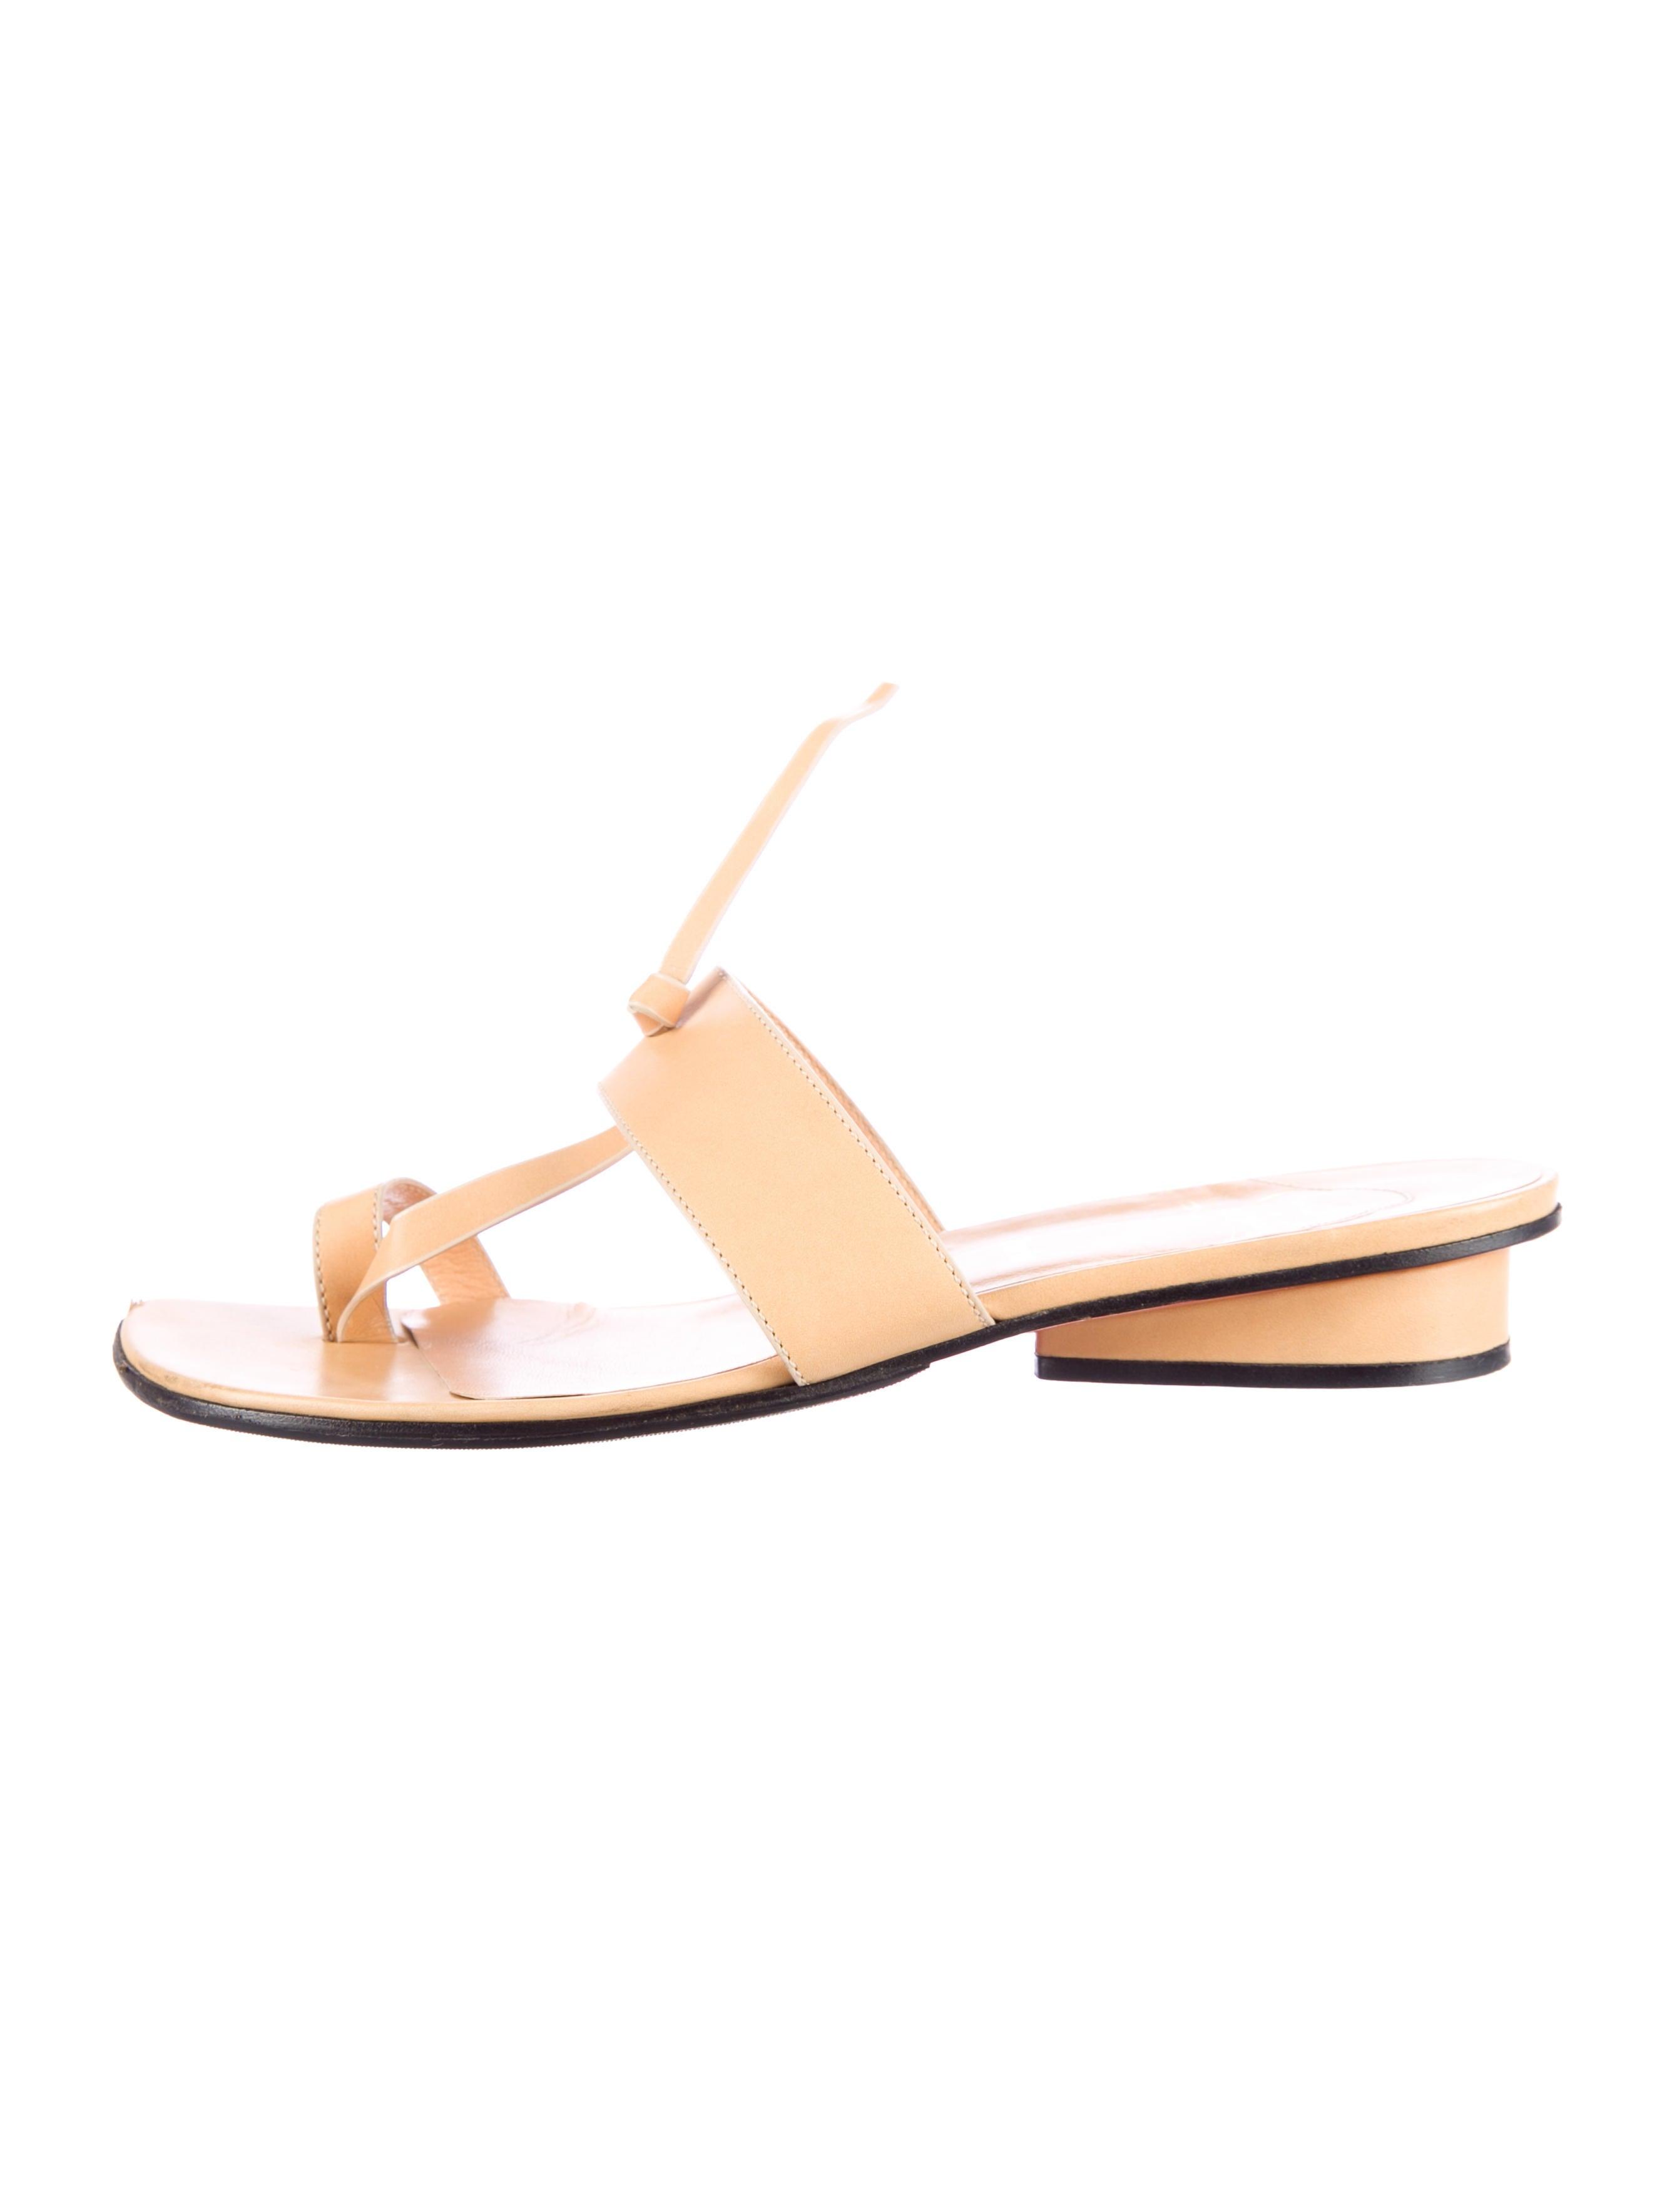 christian louboutin leather slide sandals | cosmetics digital ...